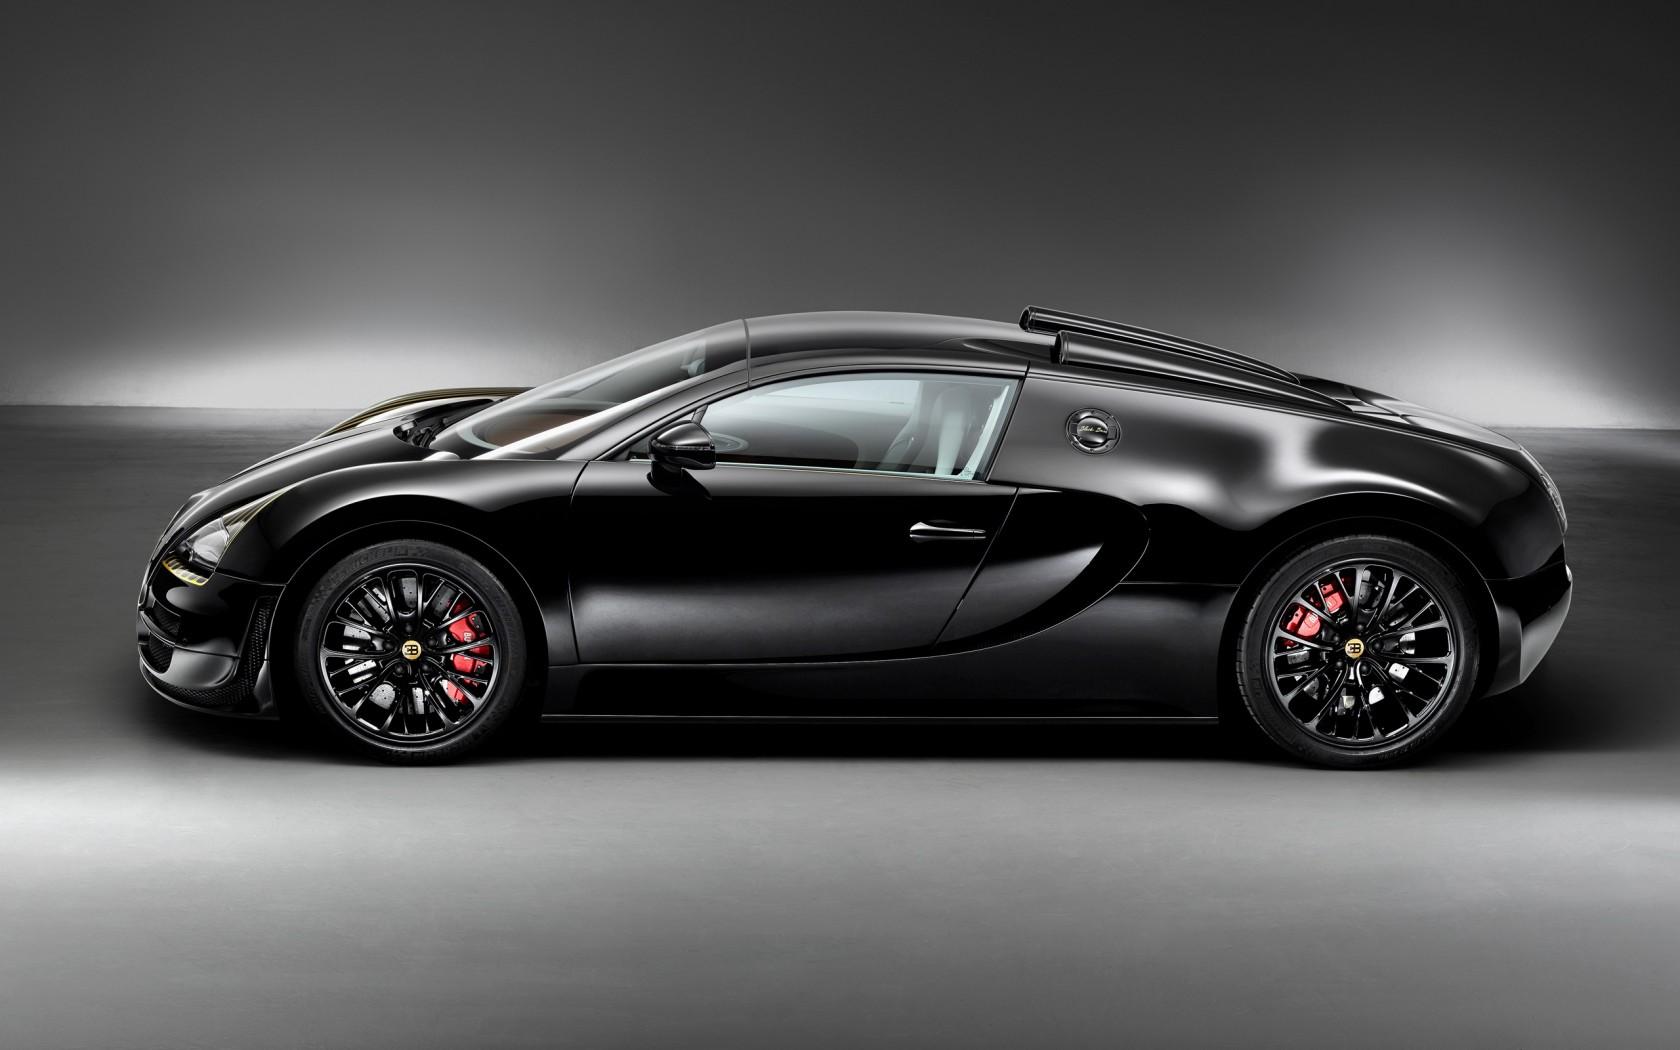 Bugatti Veyron Grand Sport Vitesse Wallpaper Hd: 2014 Bugatti Veyron Grand Sport Vitesse Legend Black Bess